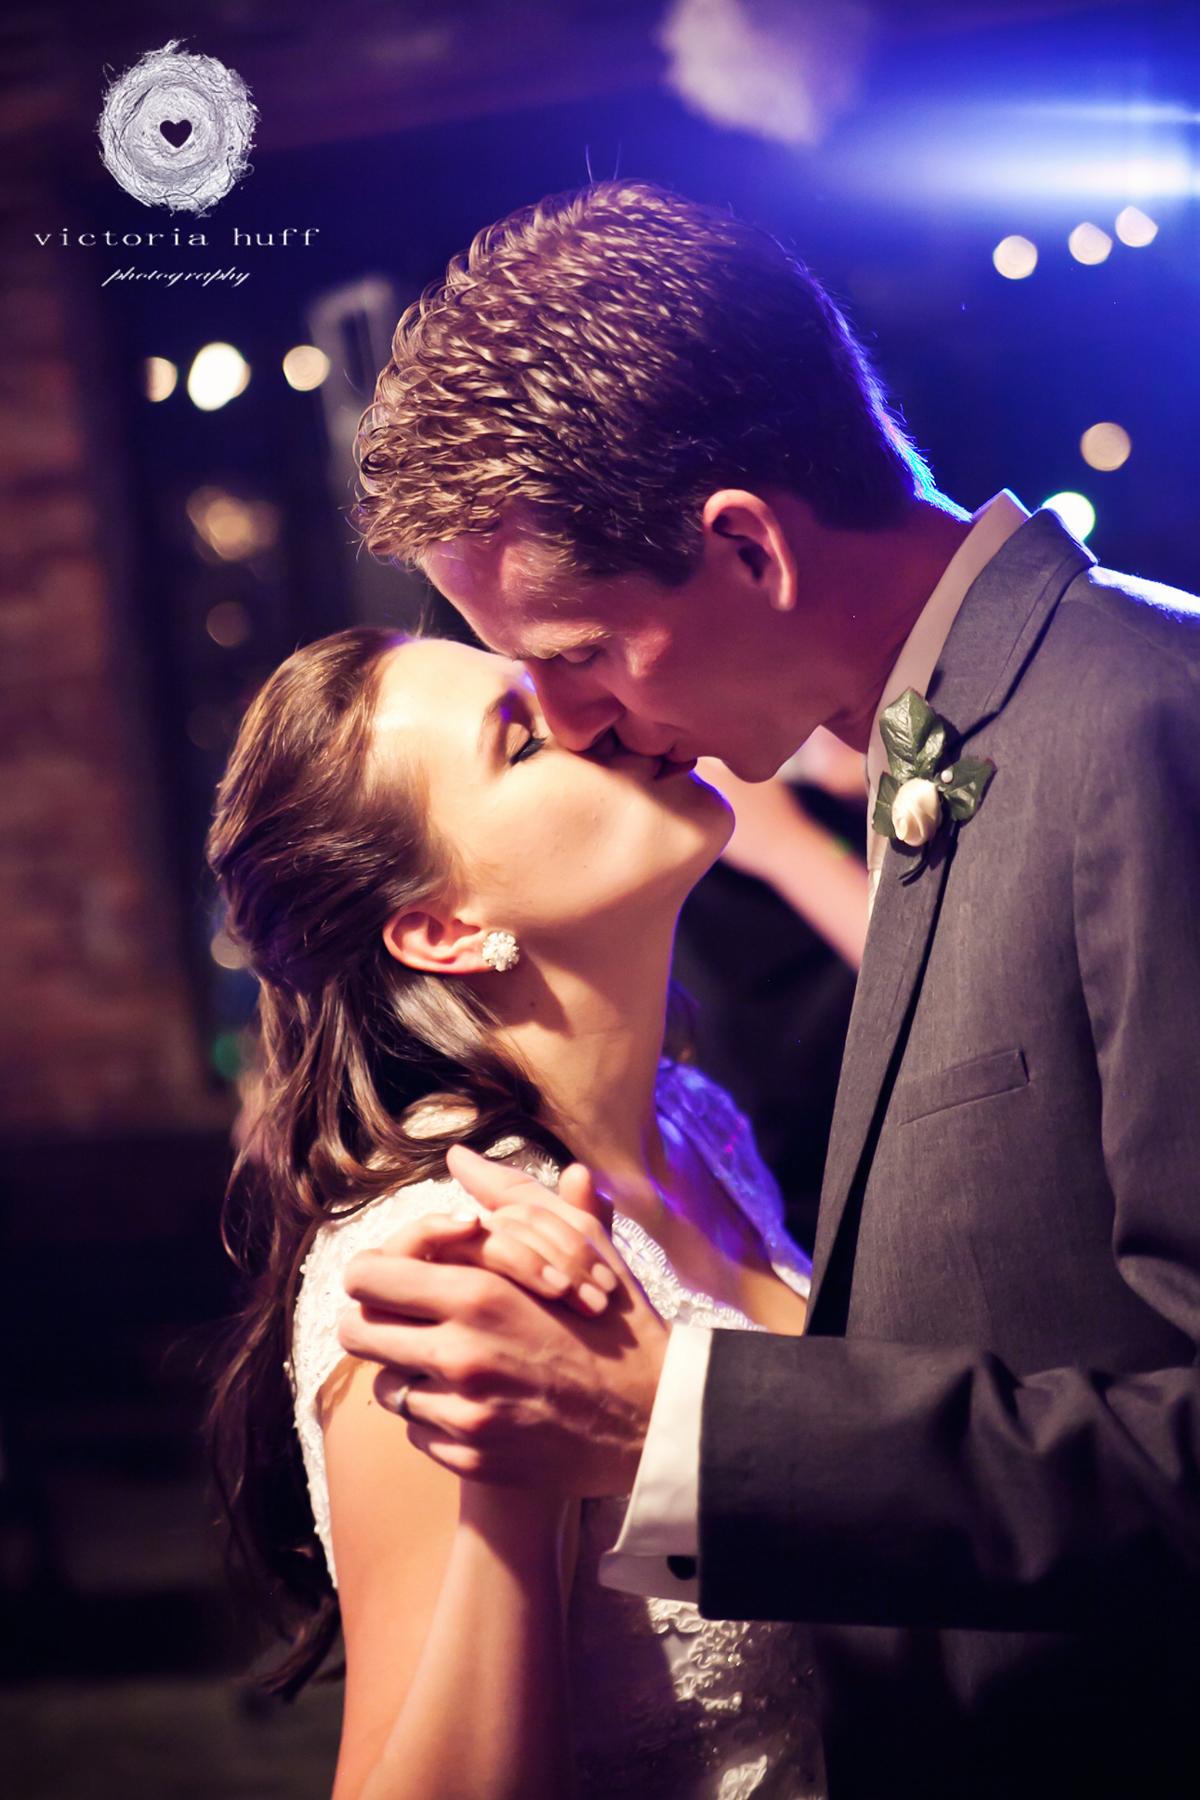 Wedding-Photography-Lindsay-Collins-Jason-Baggett-Wedding-Centennial-Park-Nashville-Tennessee-Hotel-Indigo-Vintage-937.jpg